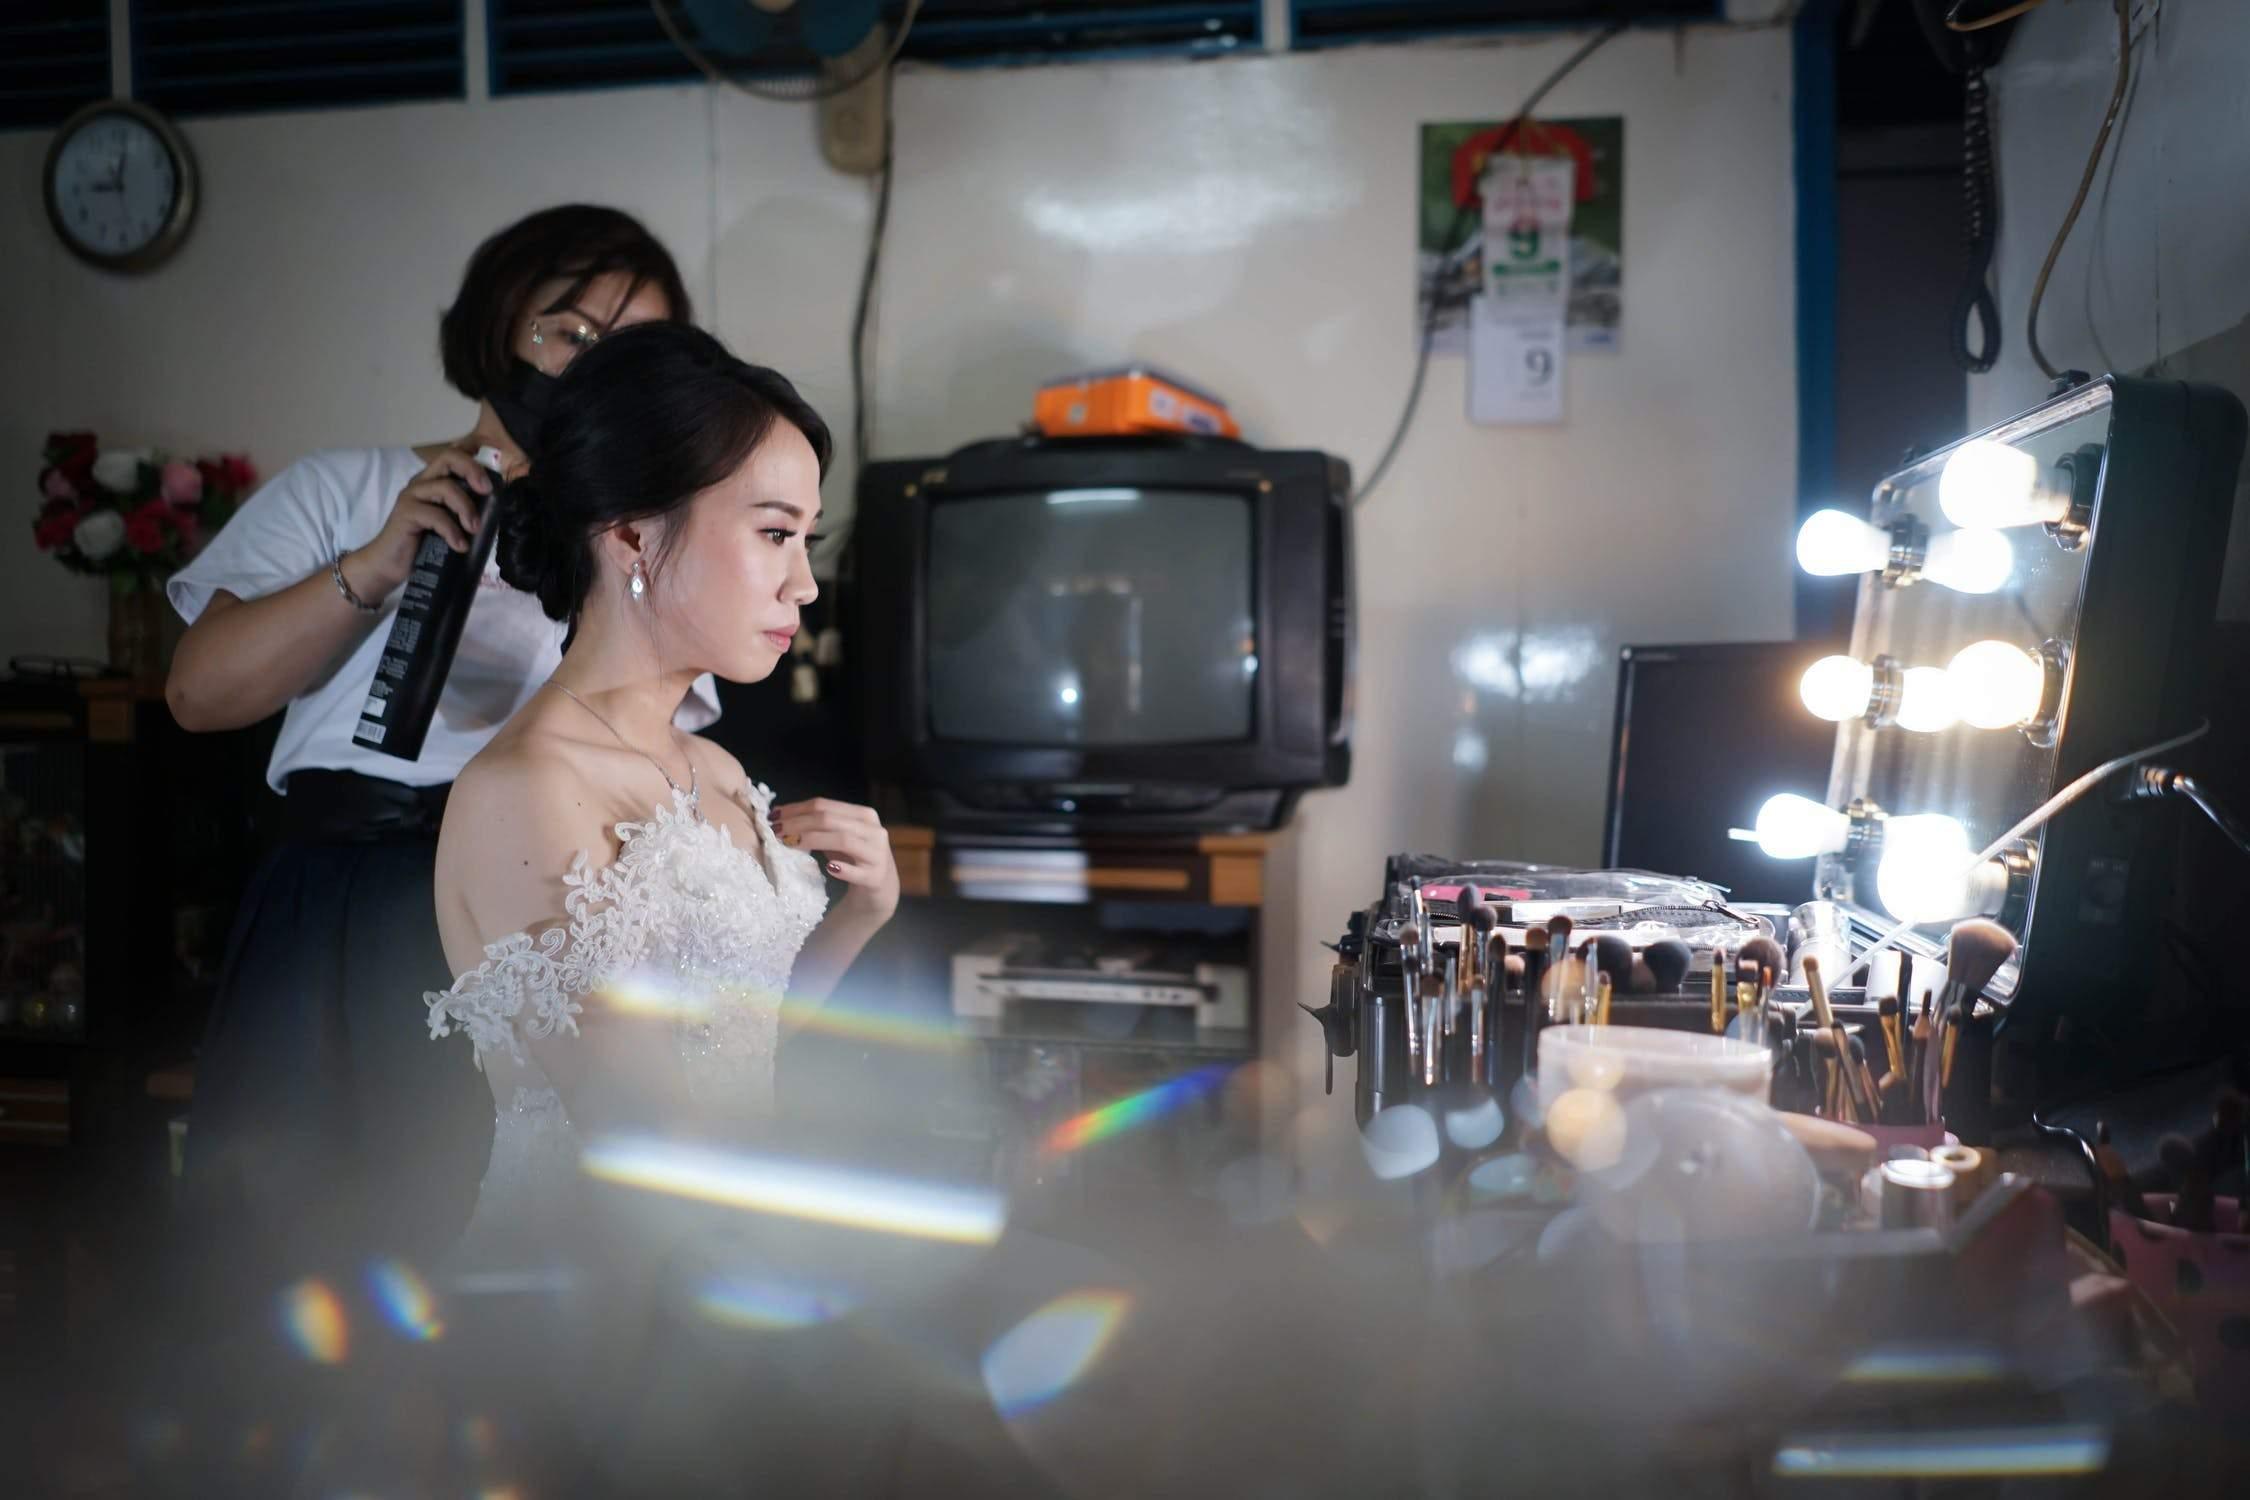 vanity mirror, yescomusa, beauty wholesale, beauty wholesale usa